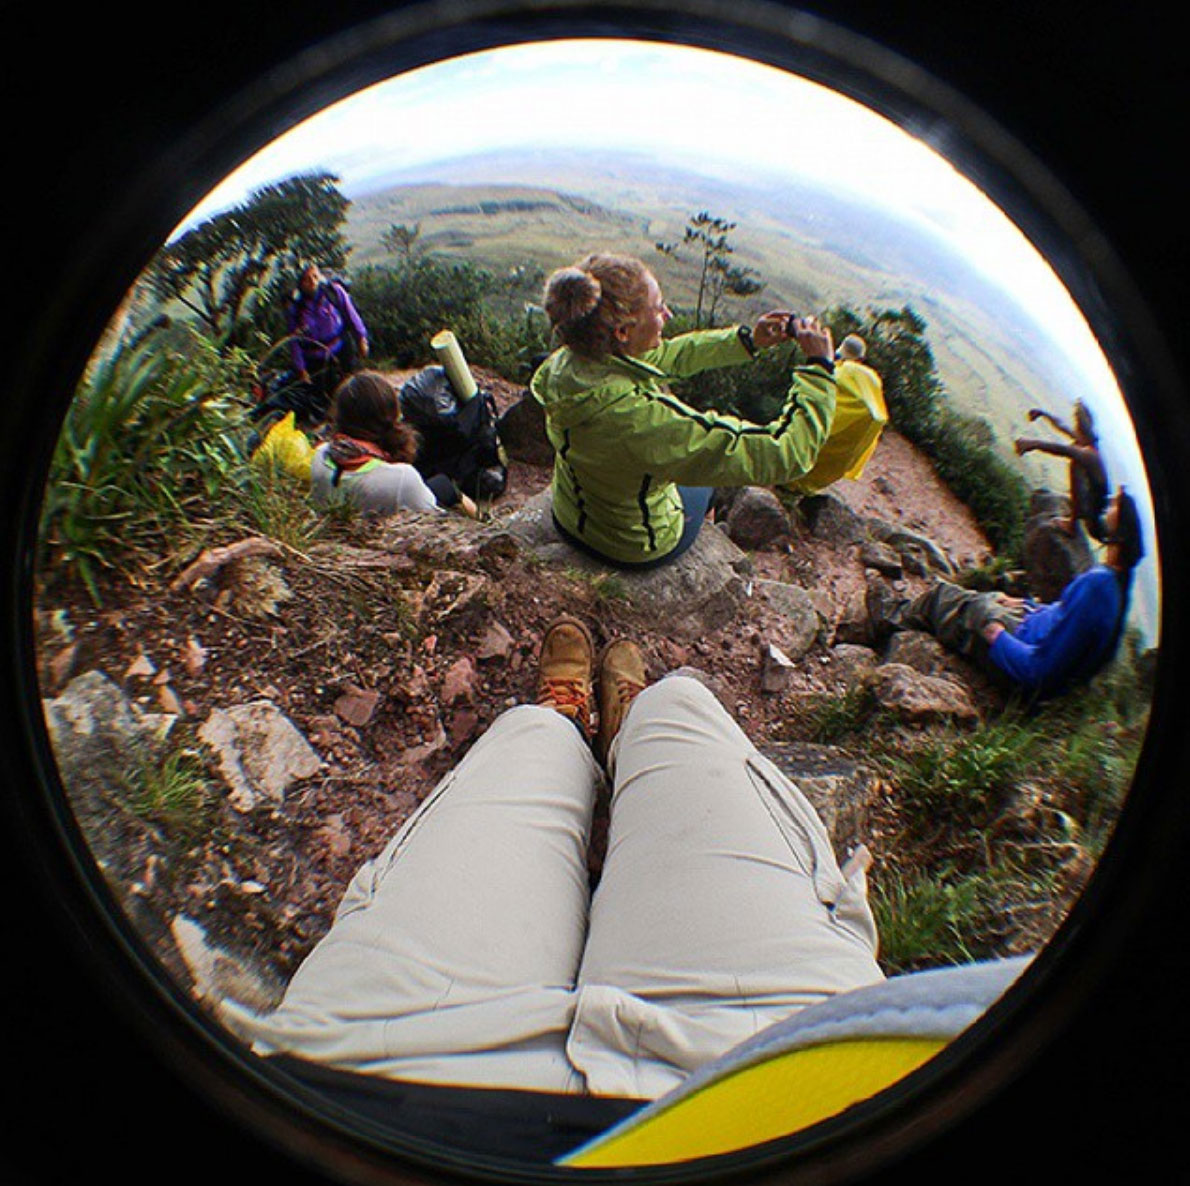 Selfie at the Roraima